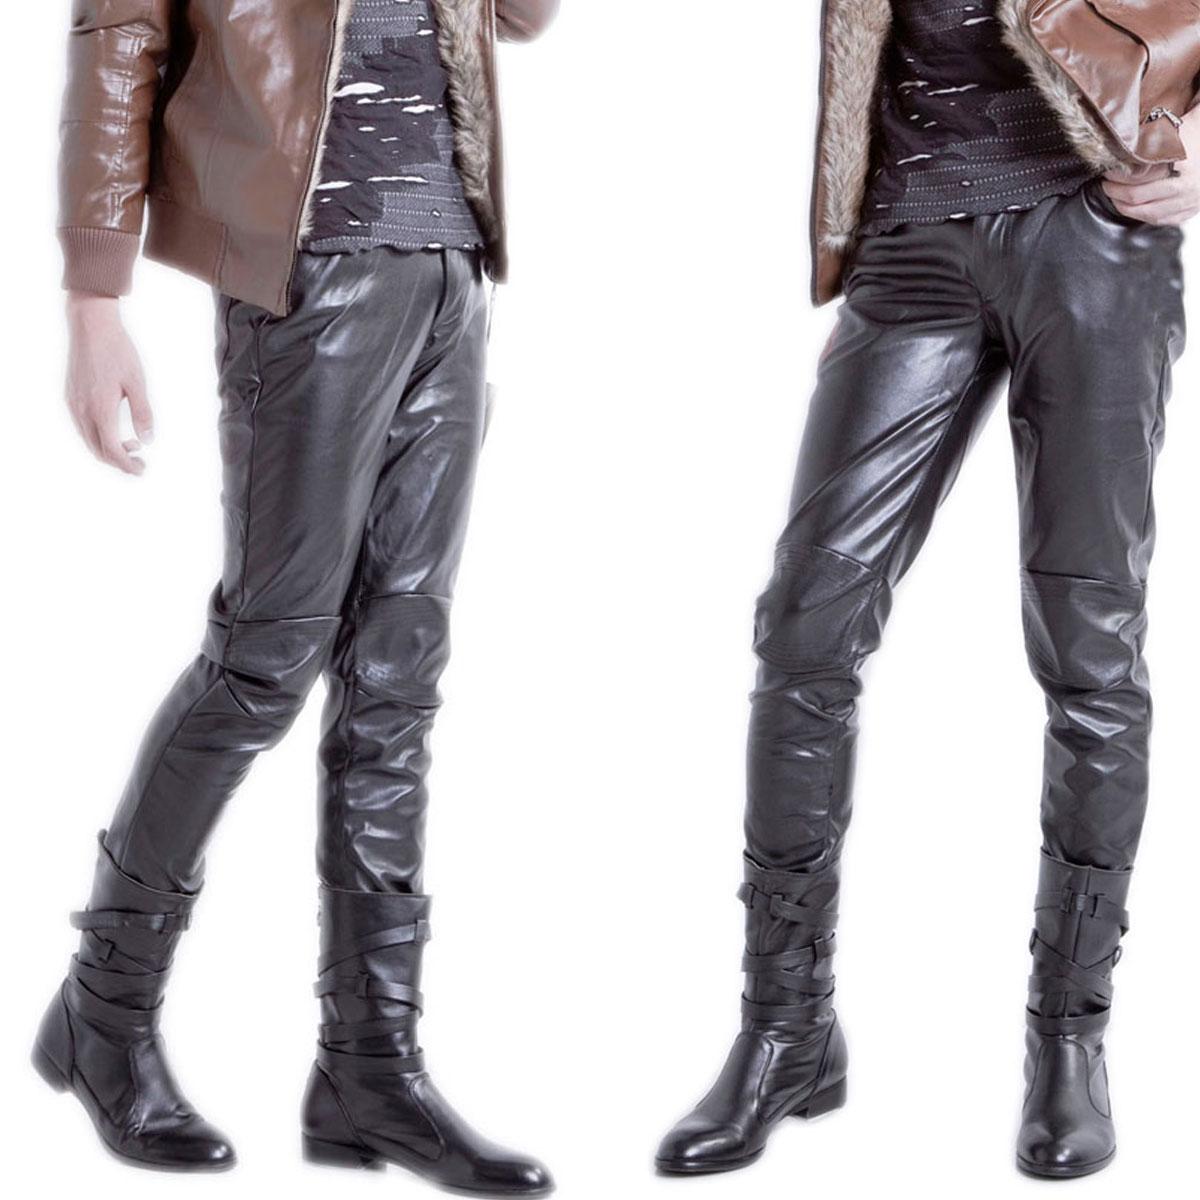 mens leather pants image is loading men-039-s-black-motorcycle-casual-leather-pants- kfcwuph